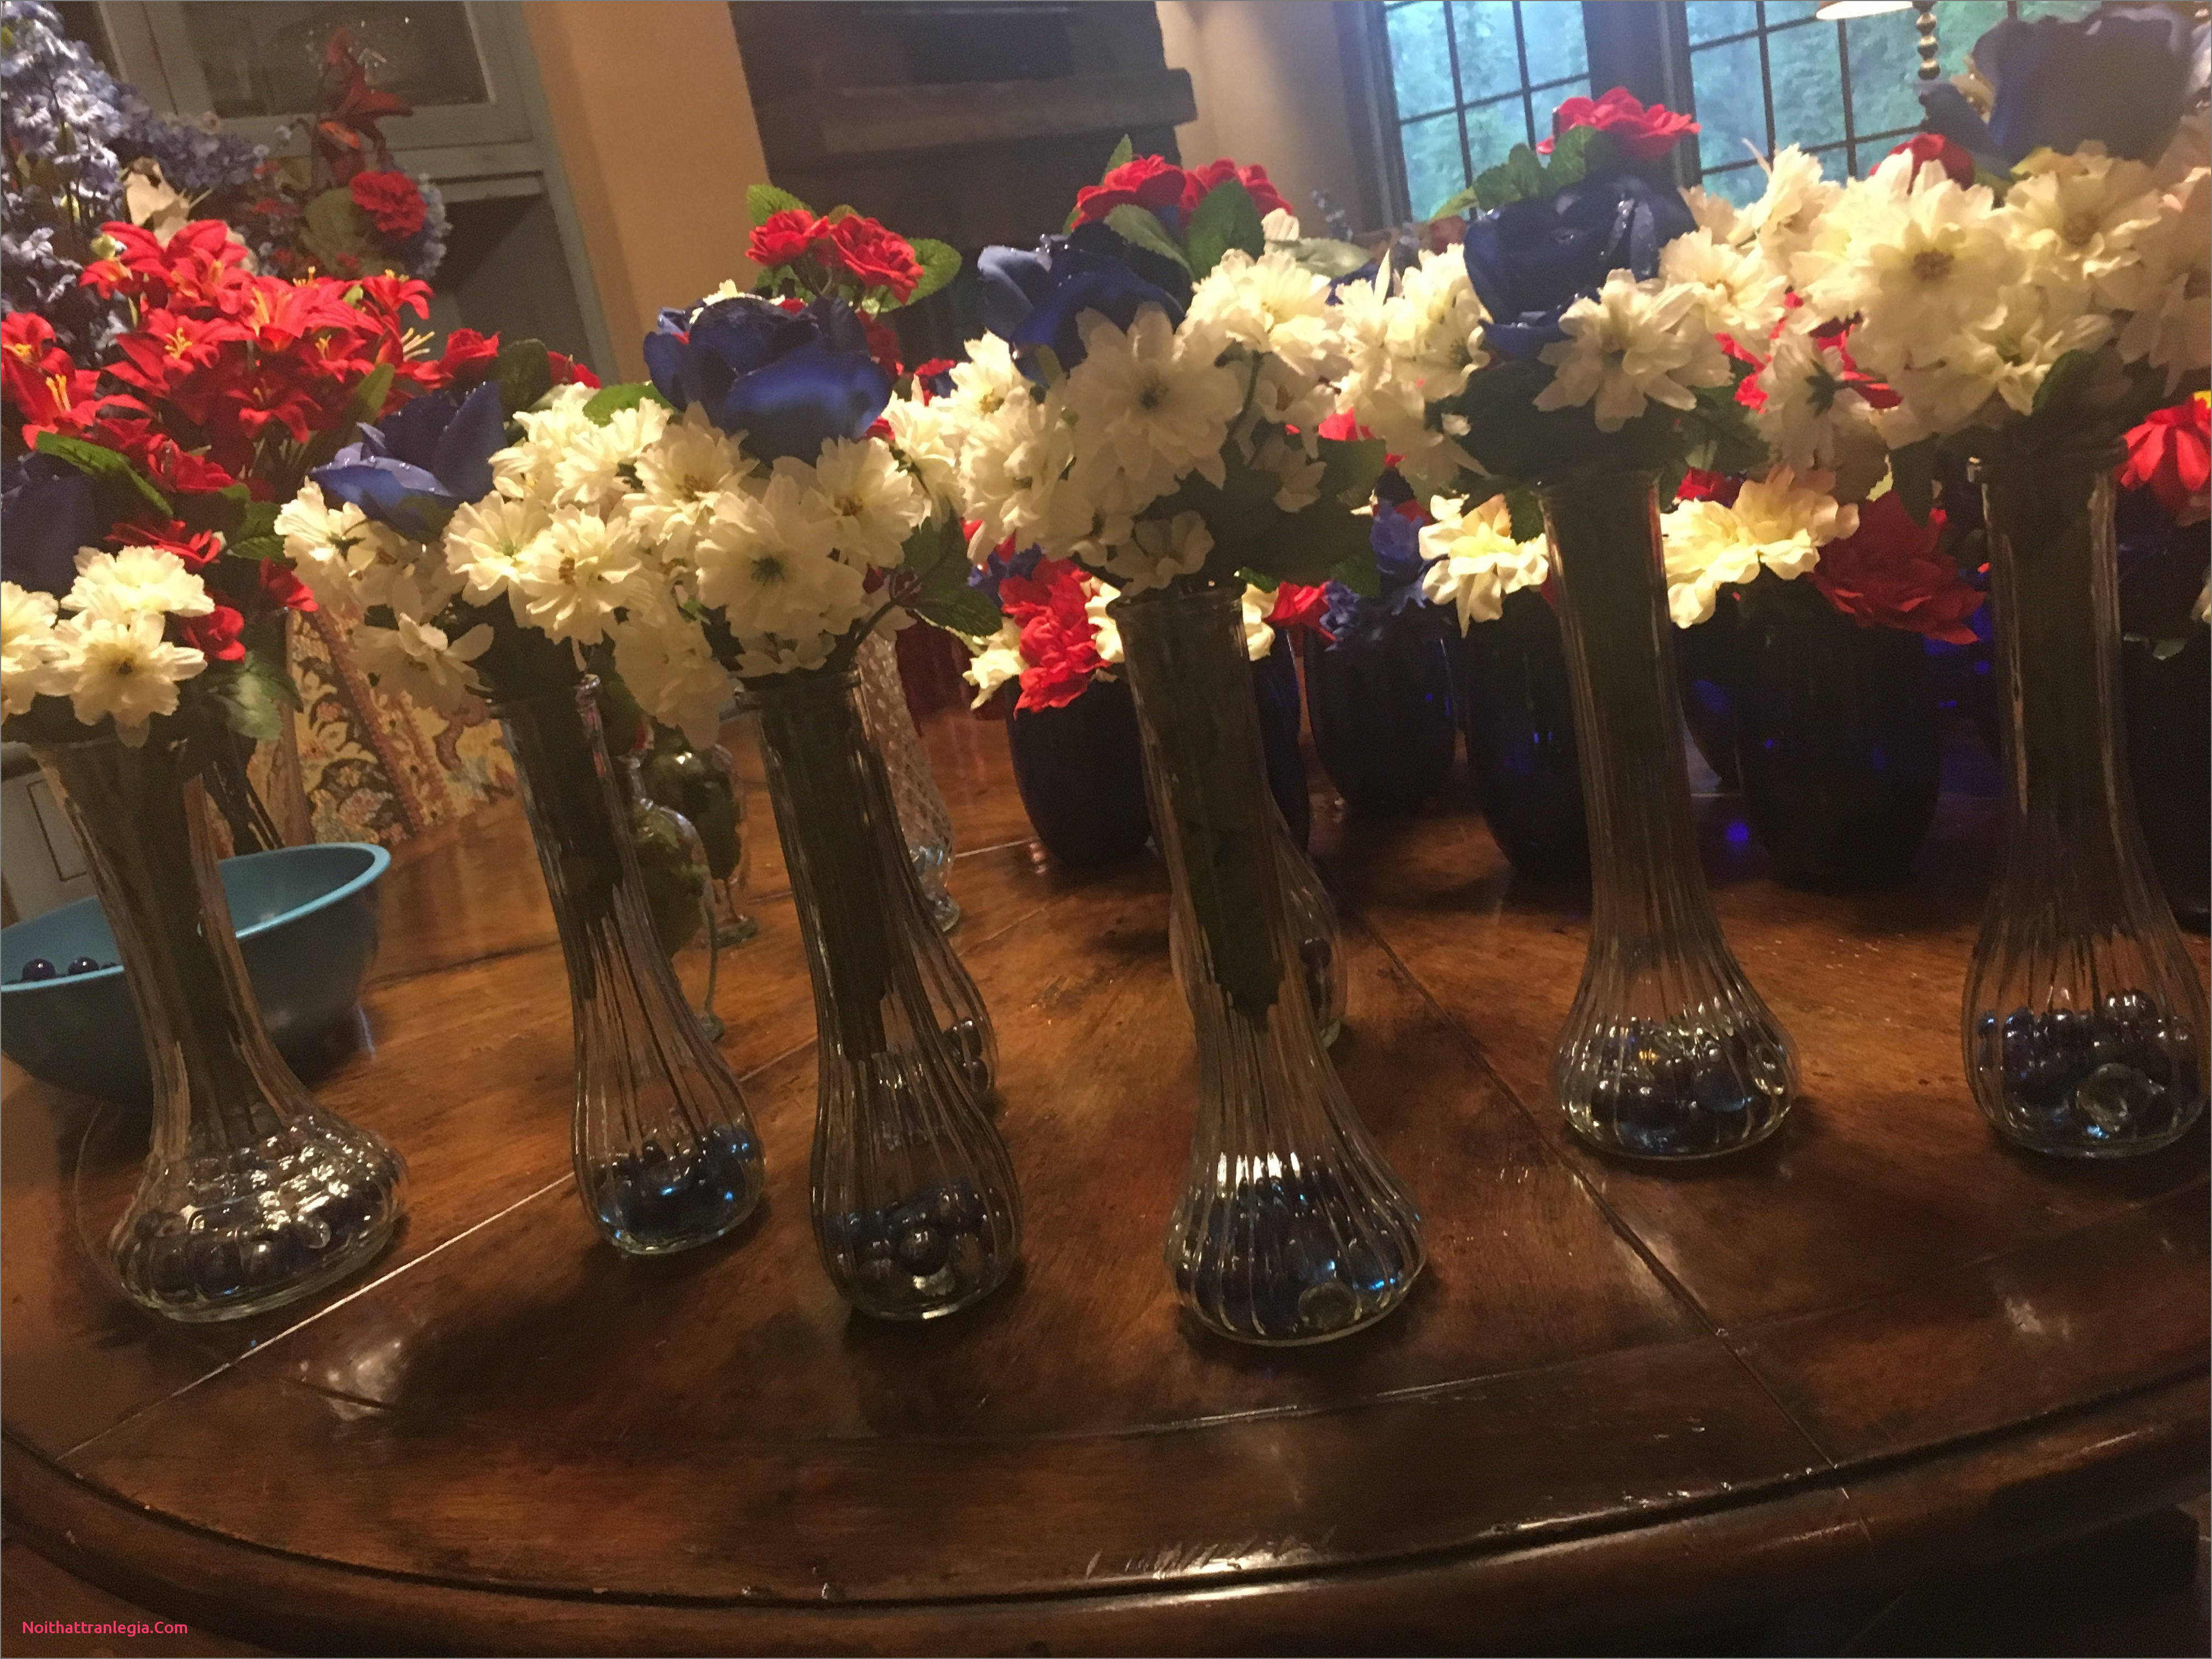 18 Popular Large Silver Floor Vase 2021 free download large silver floor vase of 20 wedding vases noithattranlegia vases design within decoration line luxury dollar tree wedding decorations awesome h vases dollar vase i 0d